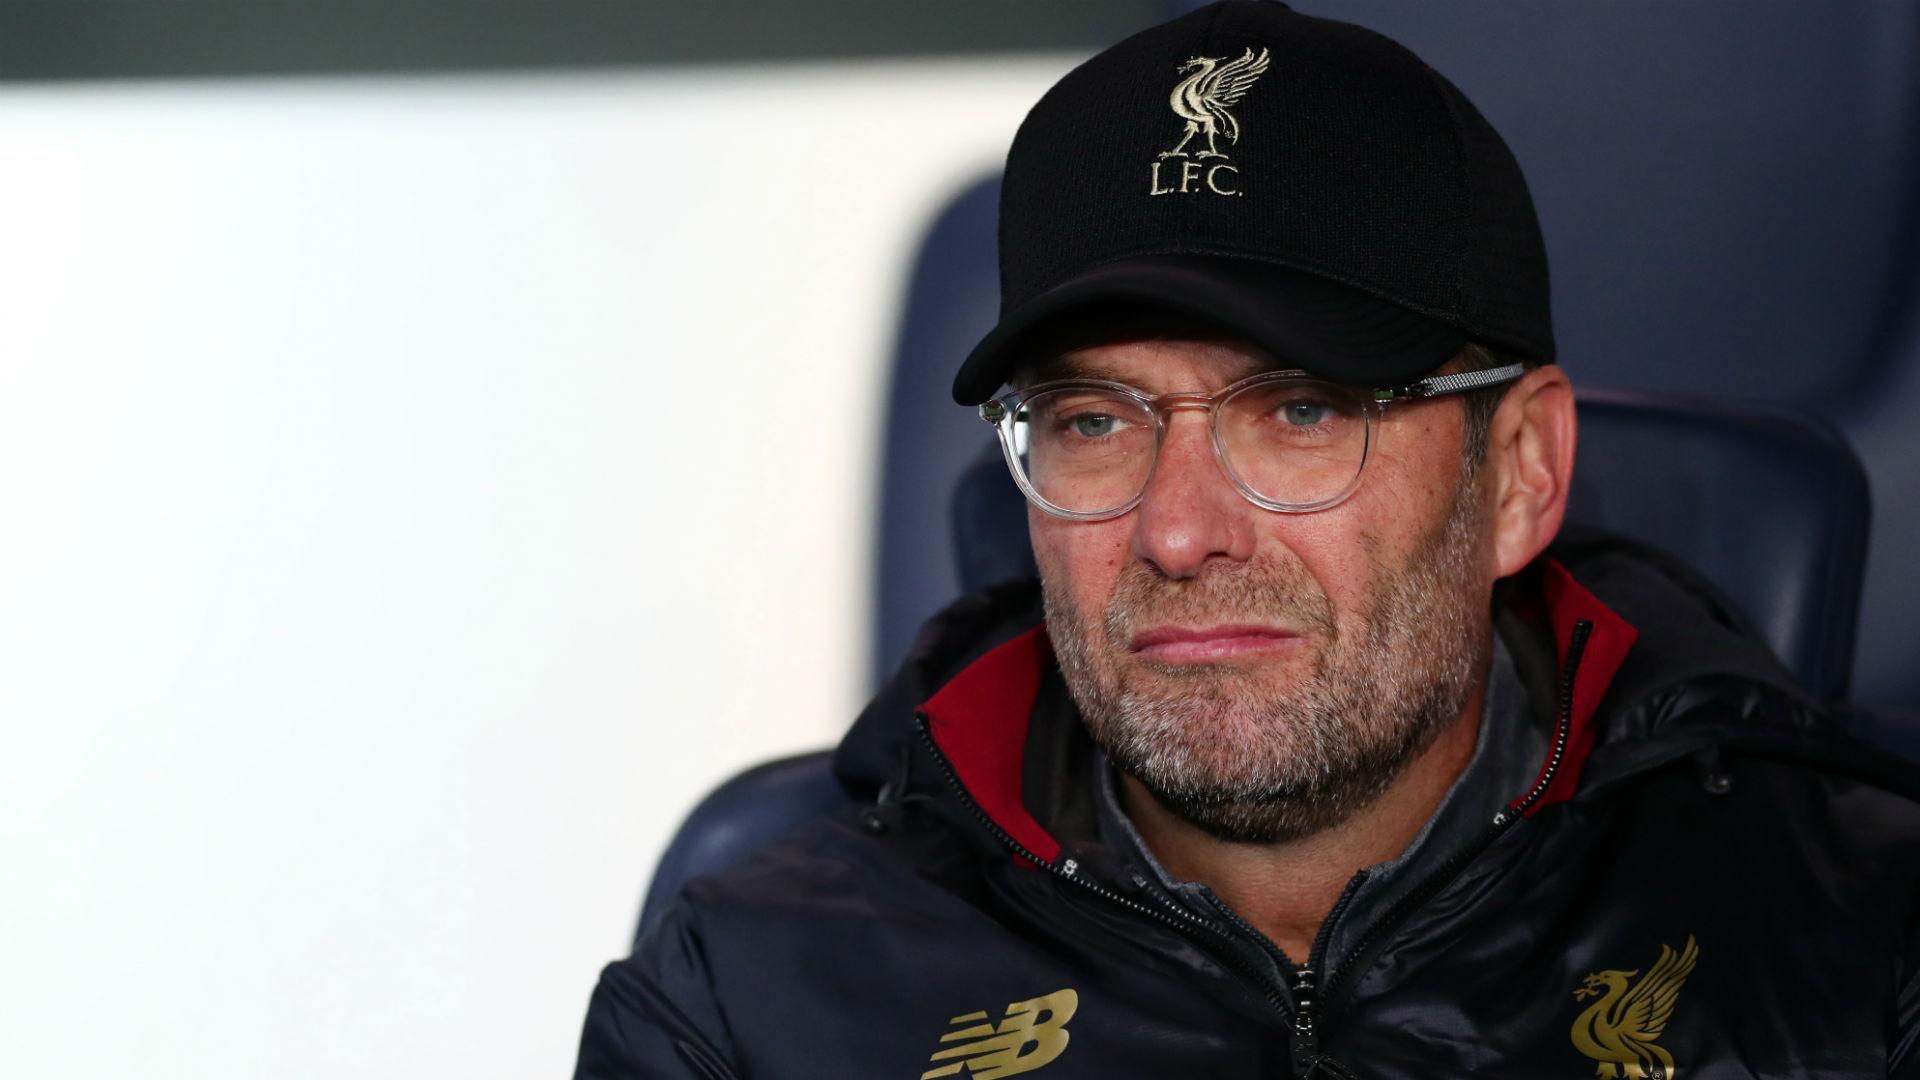 Jurgen Klopp PSG Liverpool UEFA Champions League 28112018